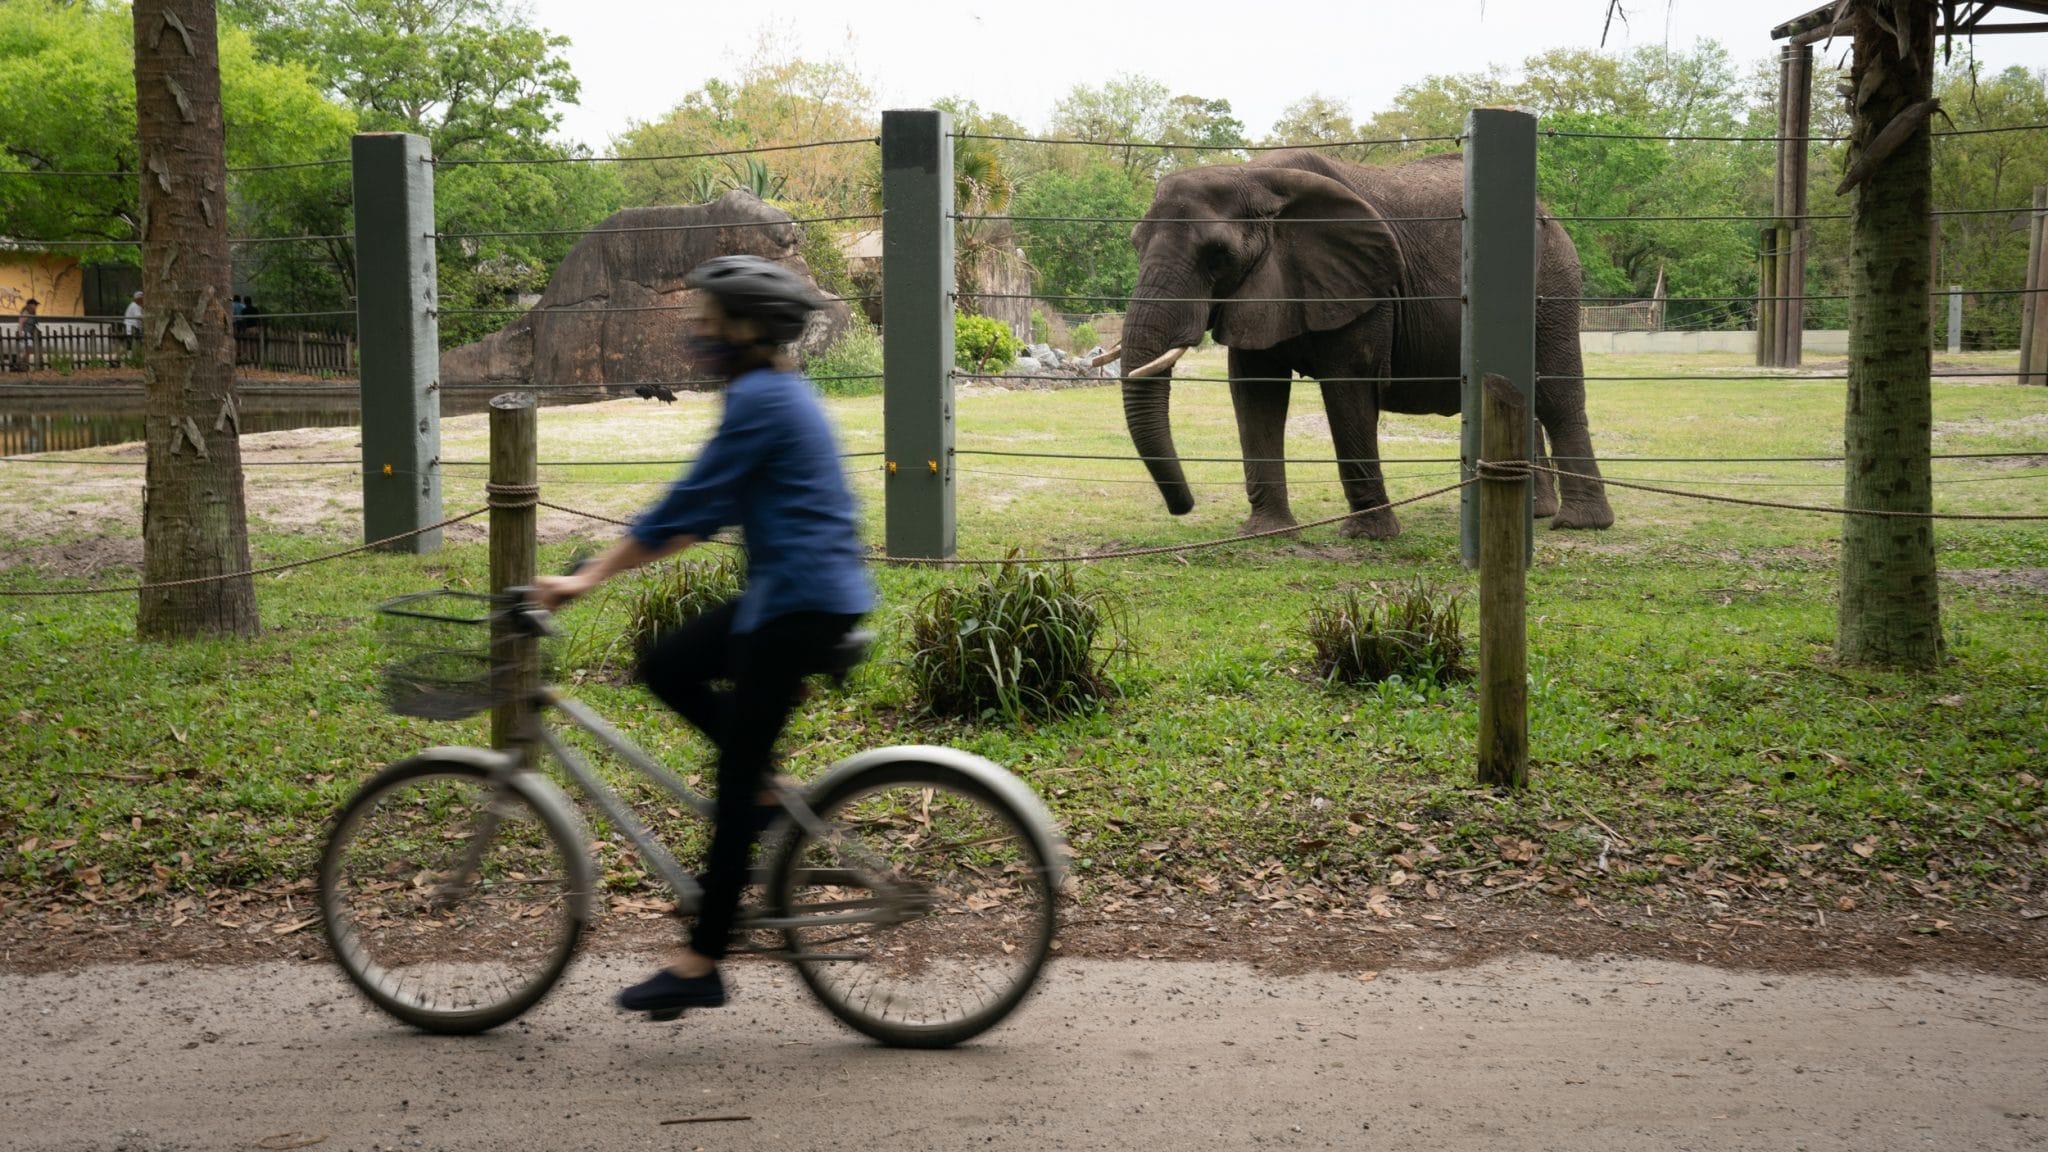 Paula Shields rides her bike through The Jacksonville Zoo.